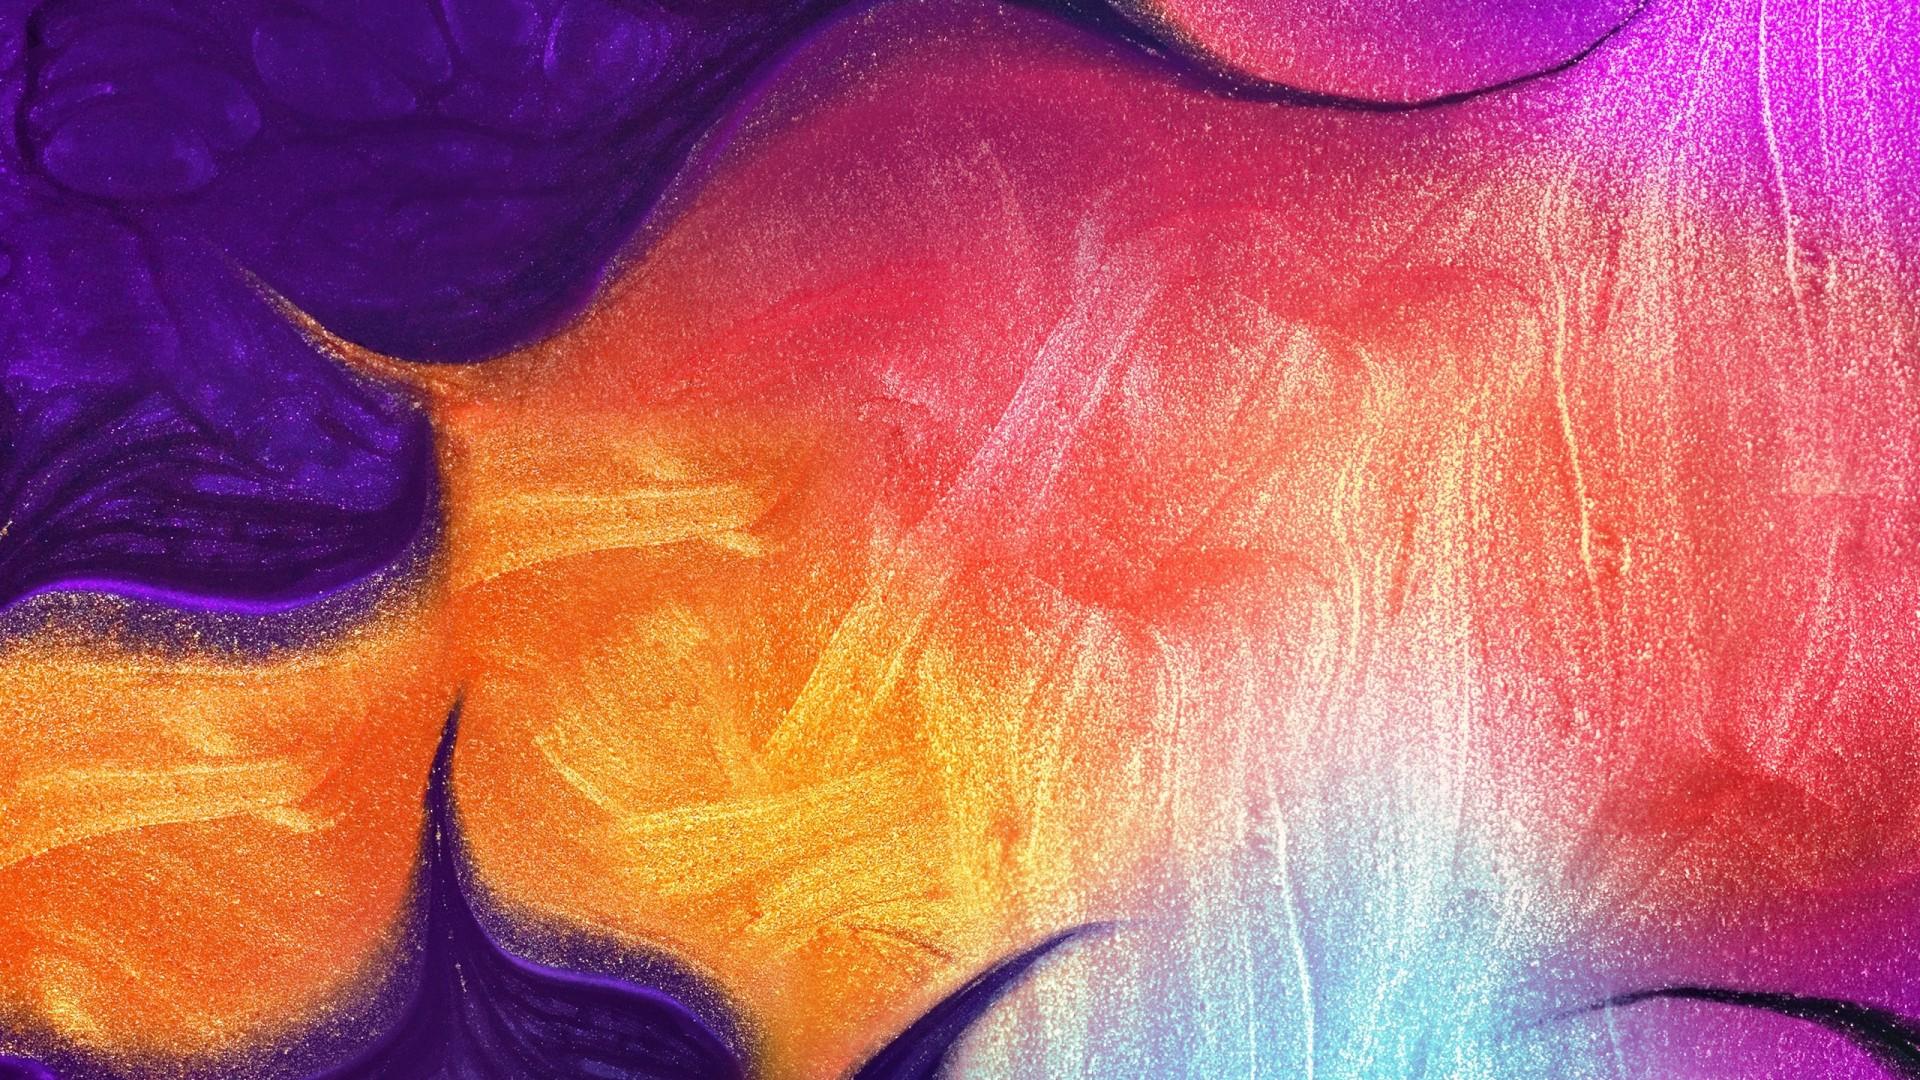 Wallpaper Samsung Galaxy A50 Abstract Colorful Hd Os 21451